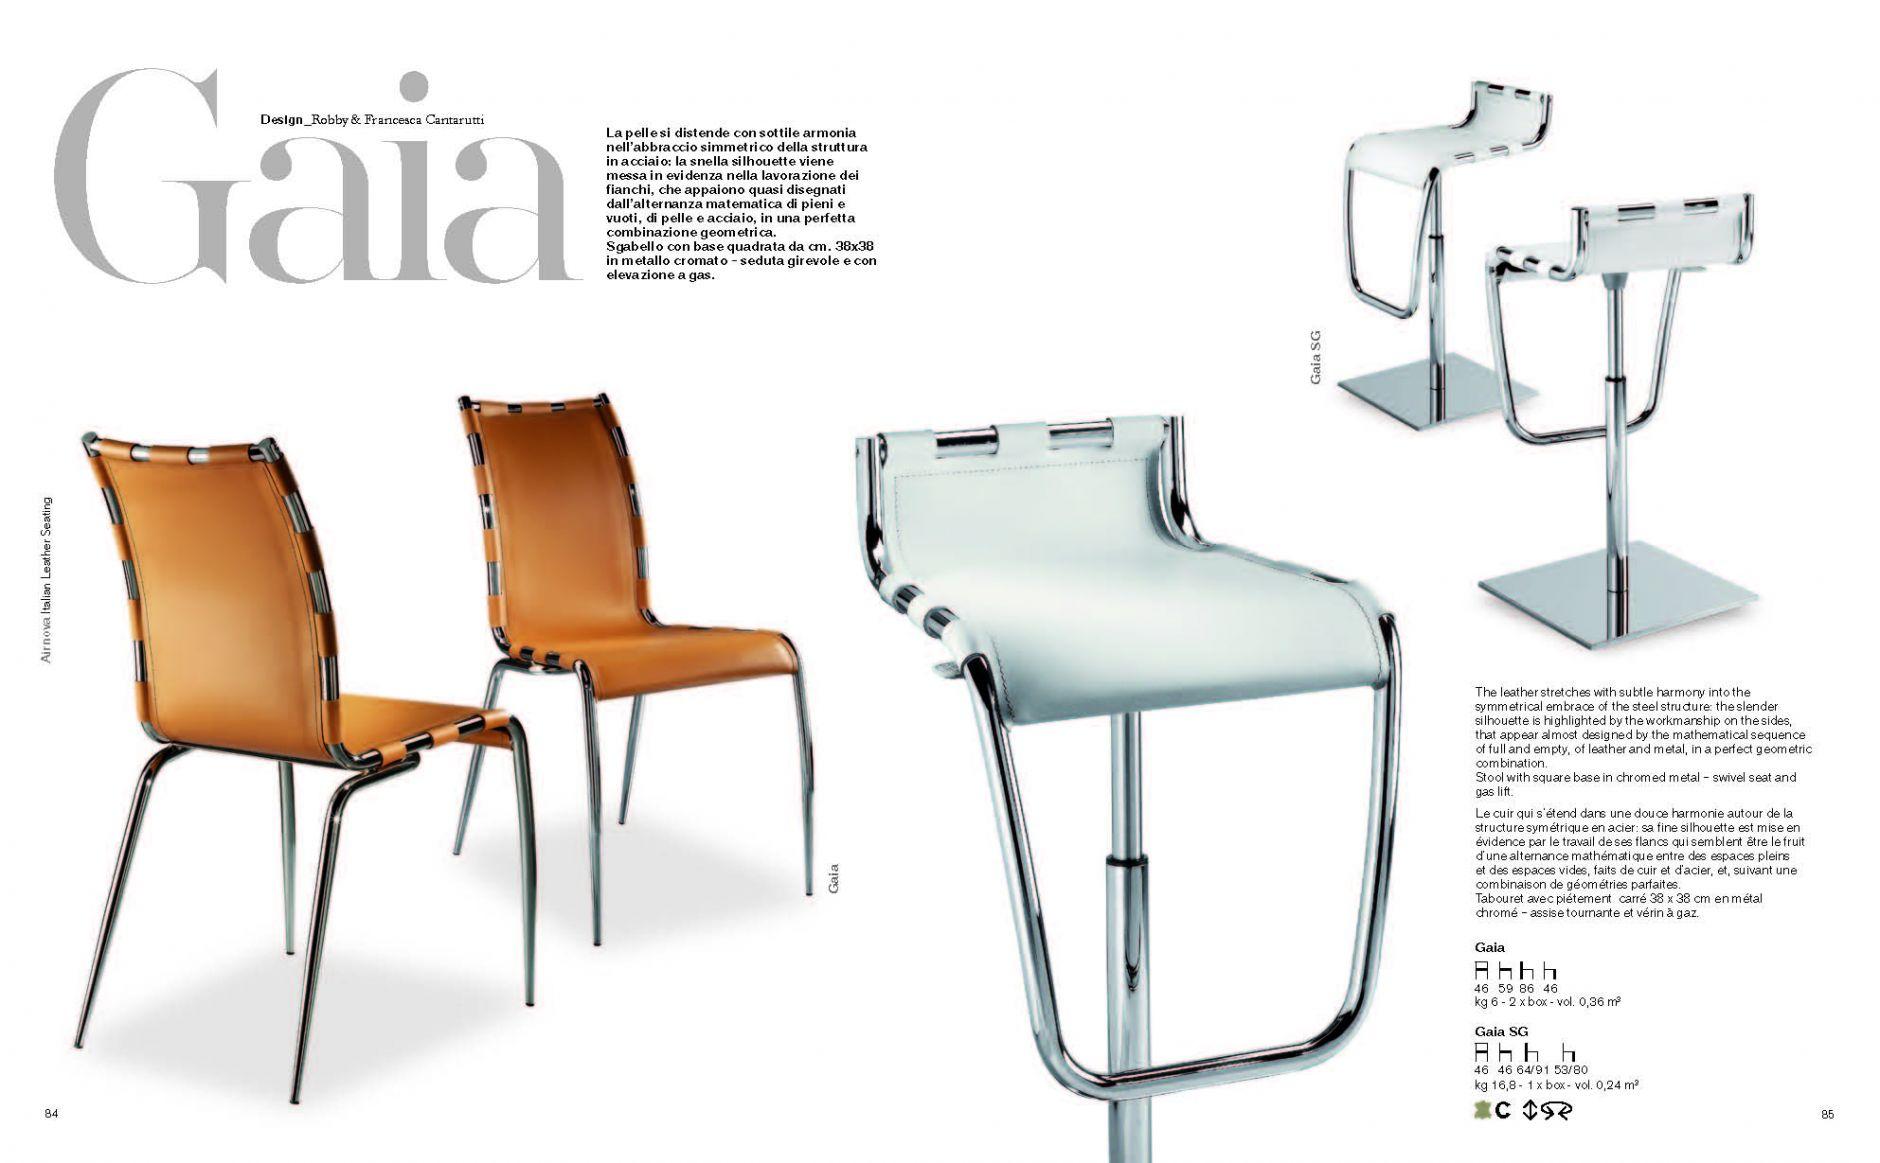 esszimmerst hle ledersessel gaiadie m bel aus italien. Black Bedroom Furniture Sets. Home Design Ideas